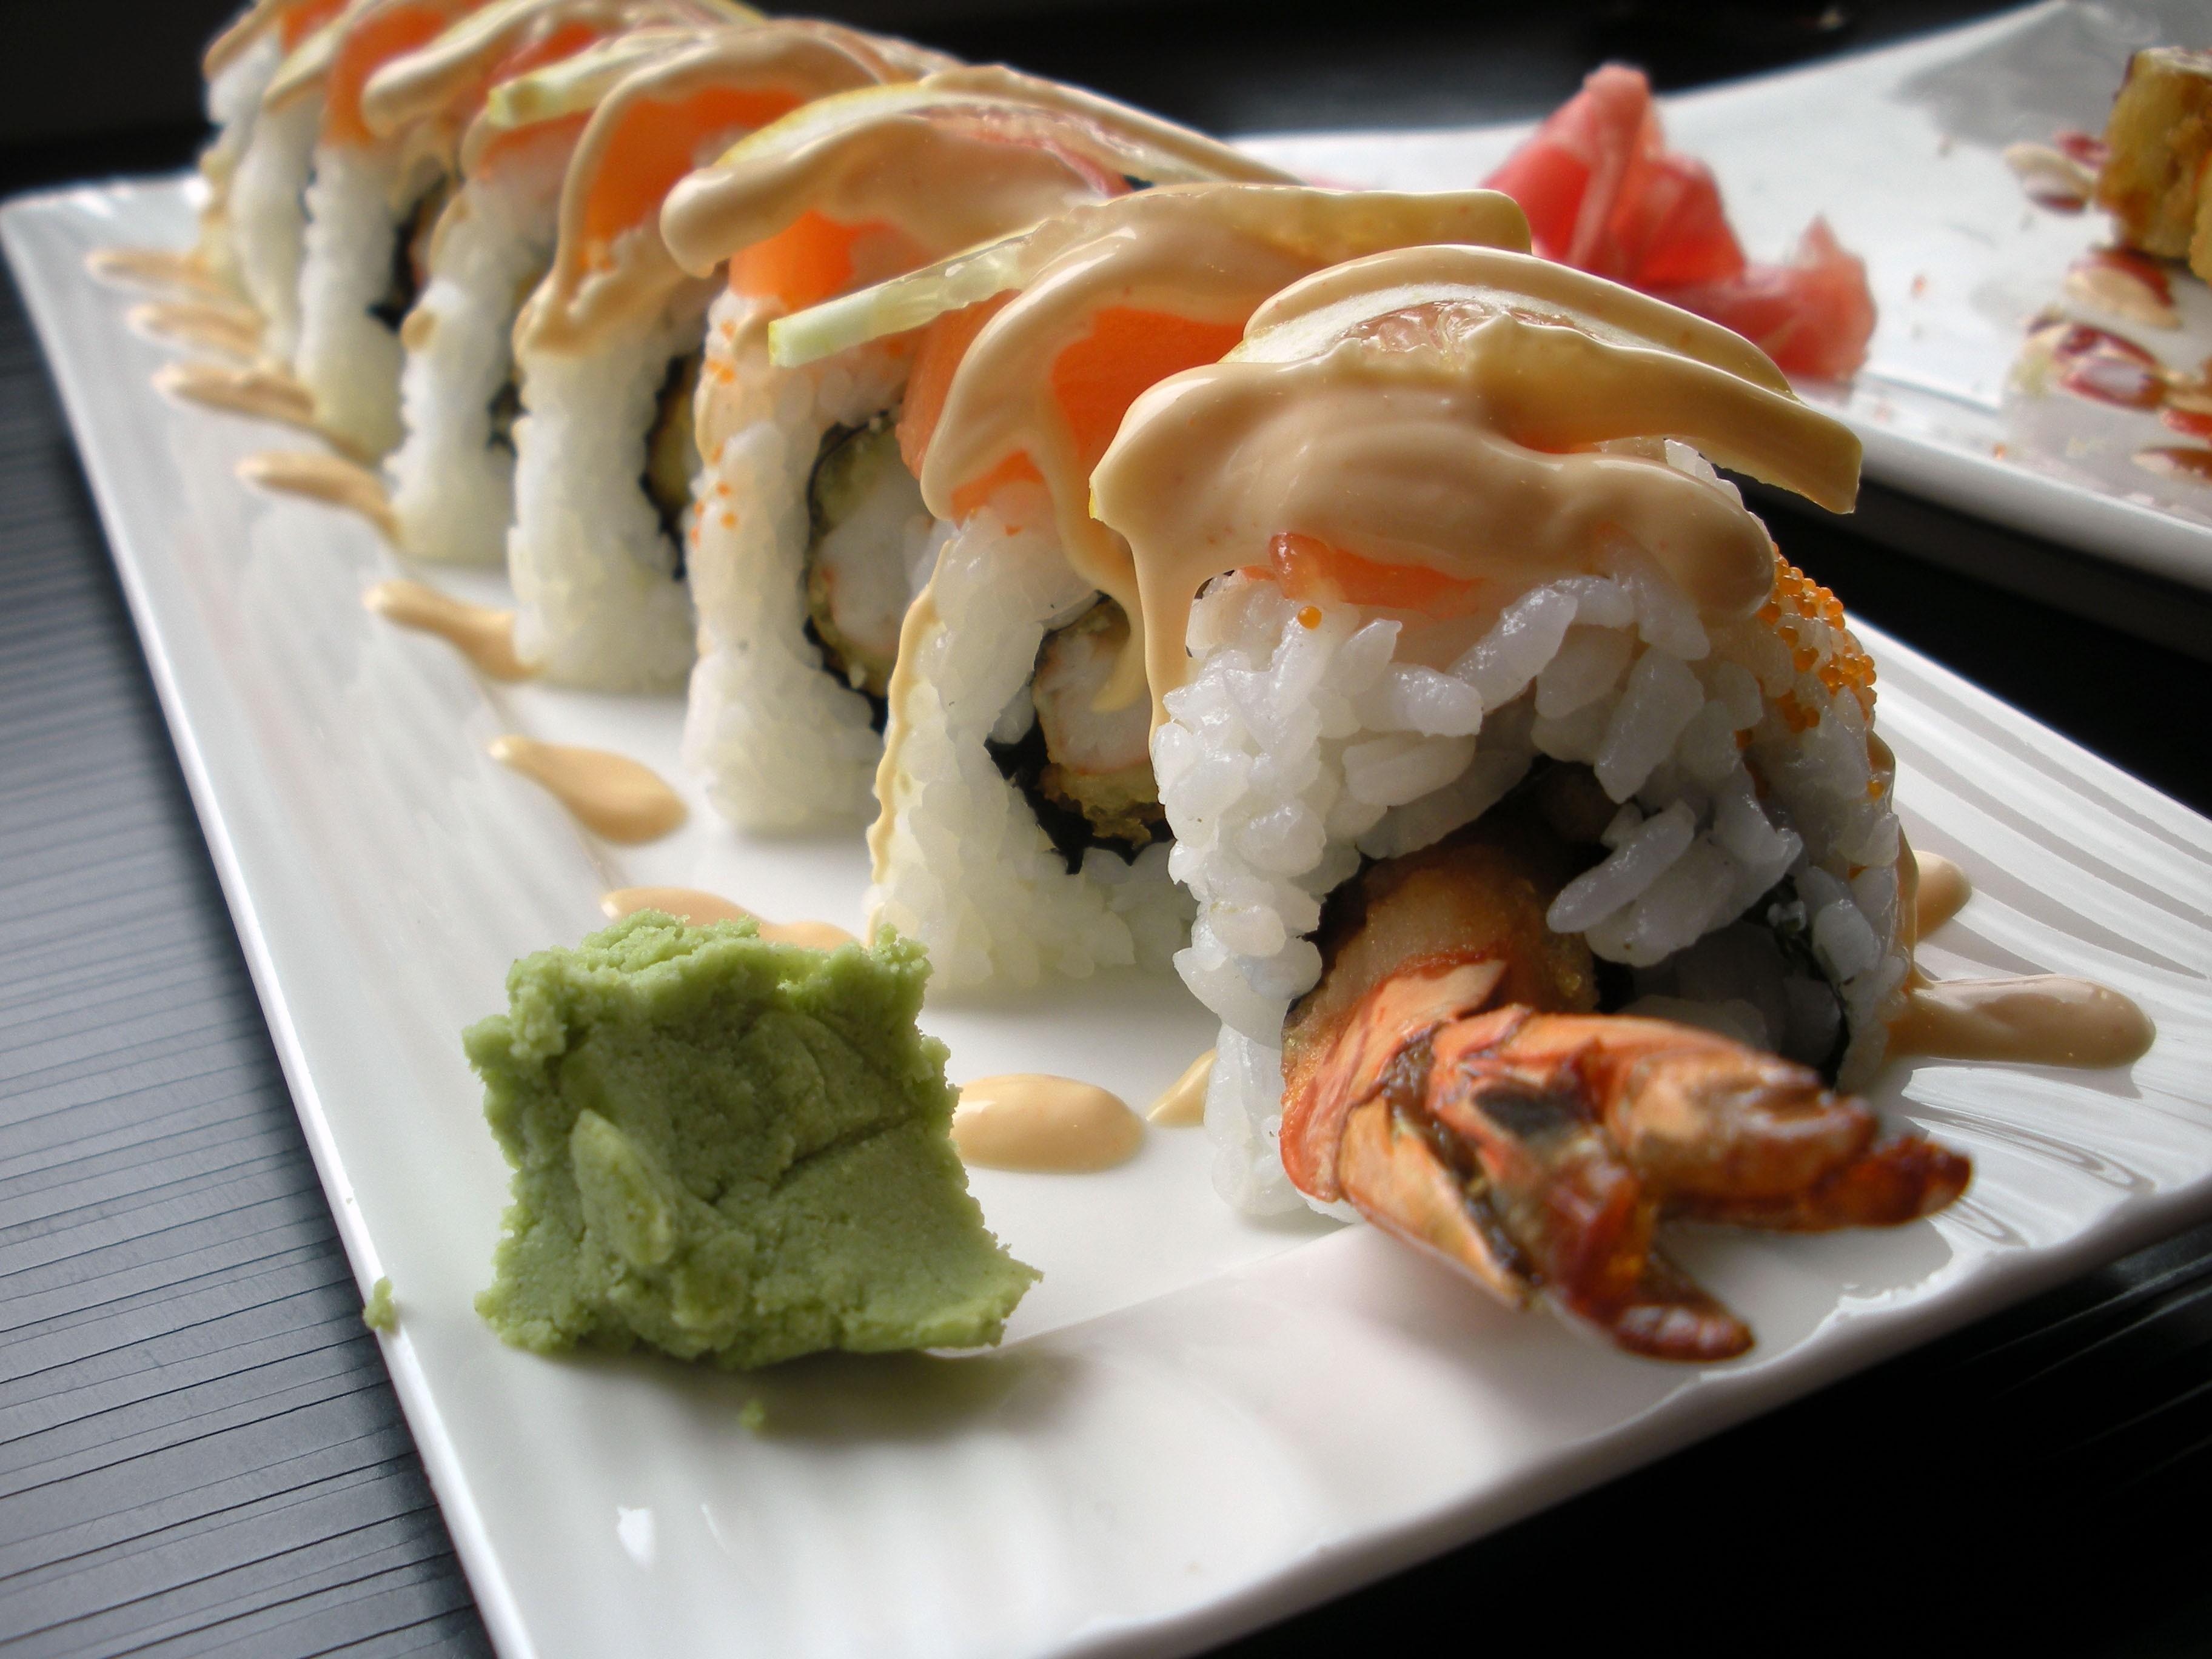 Enter the Golden Dragon roll. - JENNIFER FUMIKO CAHILL